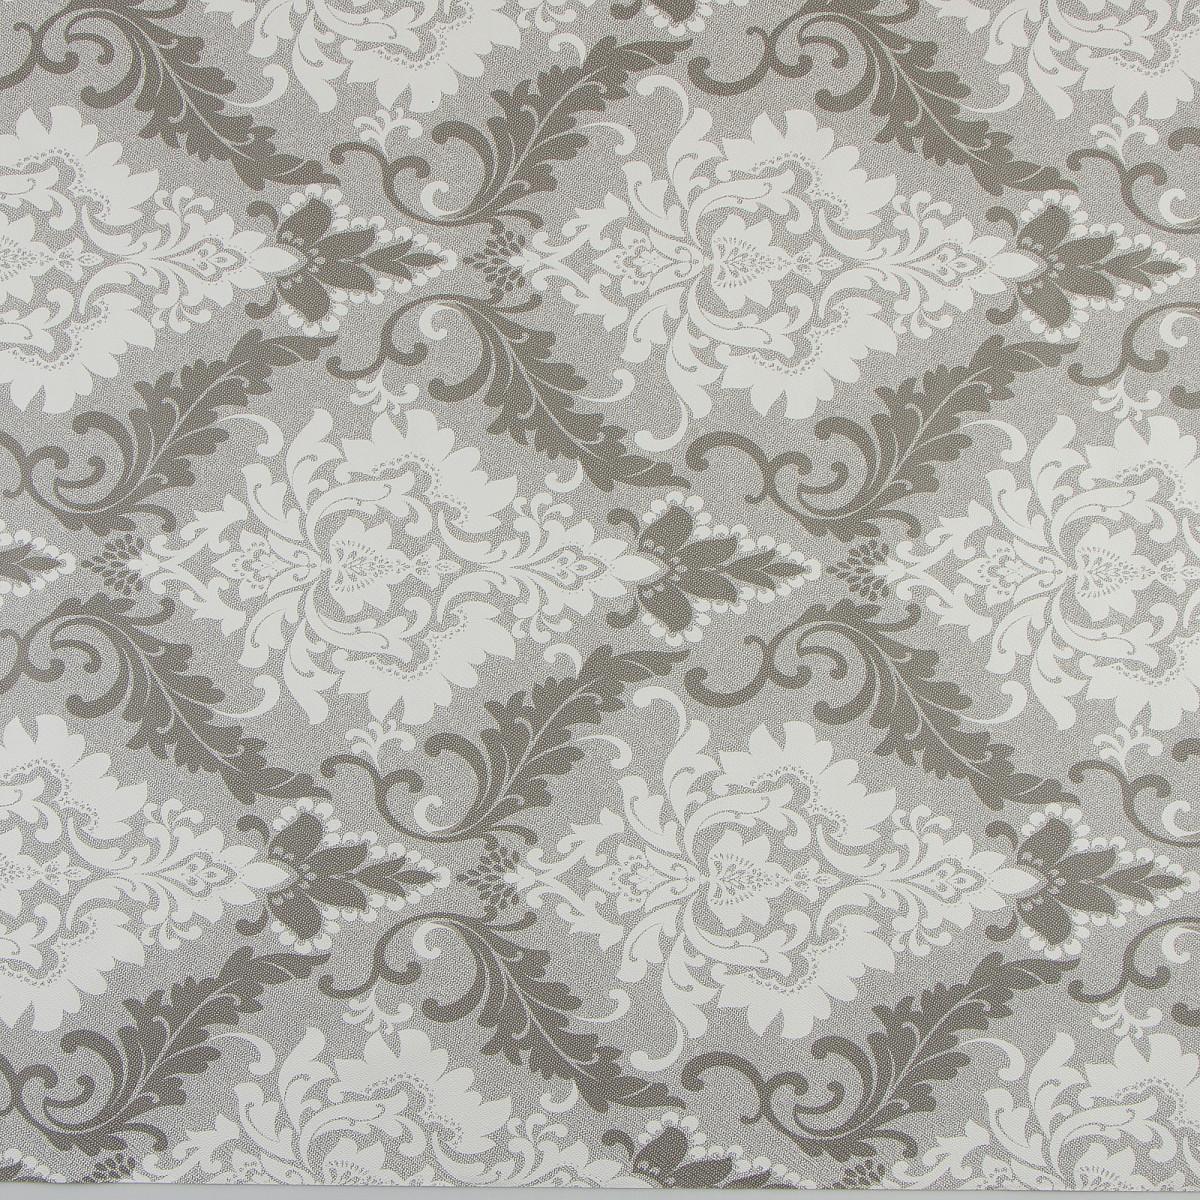 Обои флизелиновые 106х10 м узоры серый ED93353-32